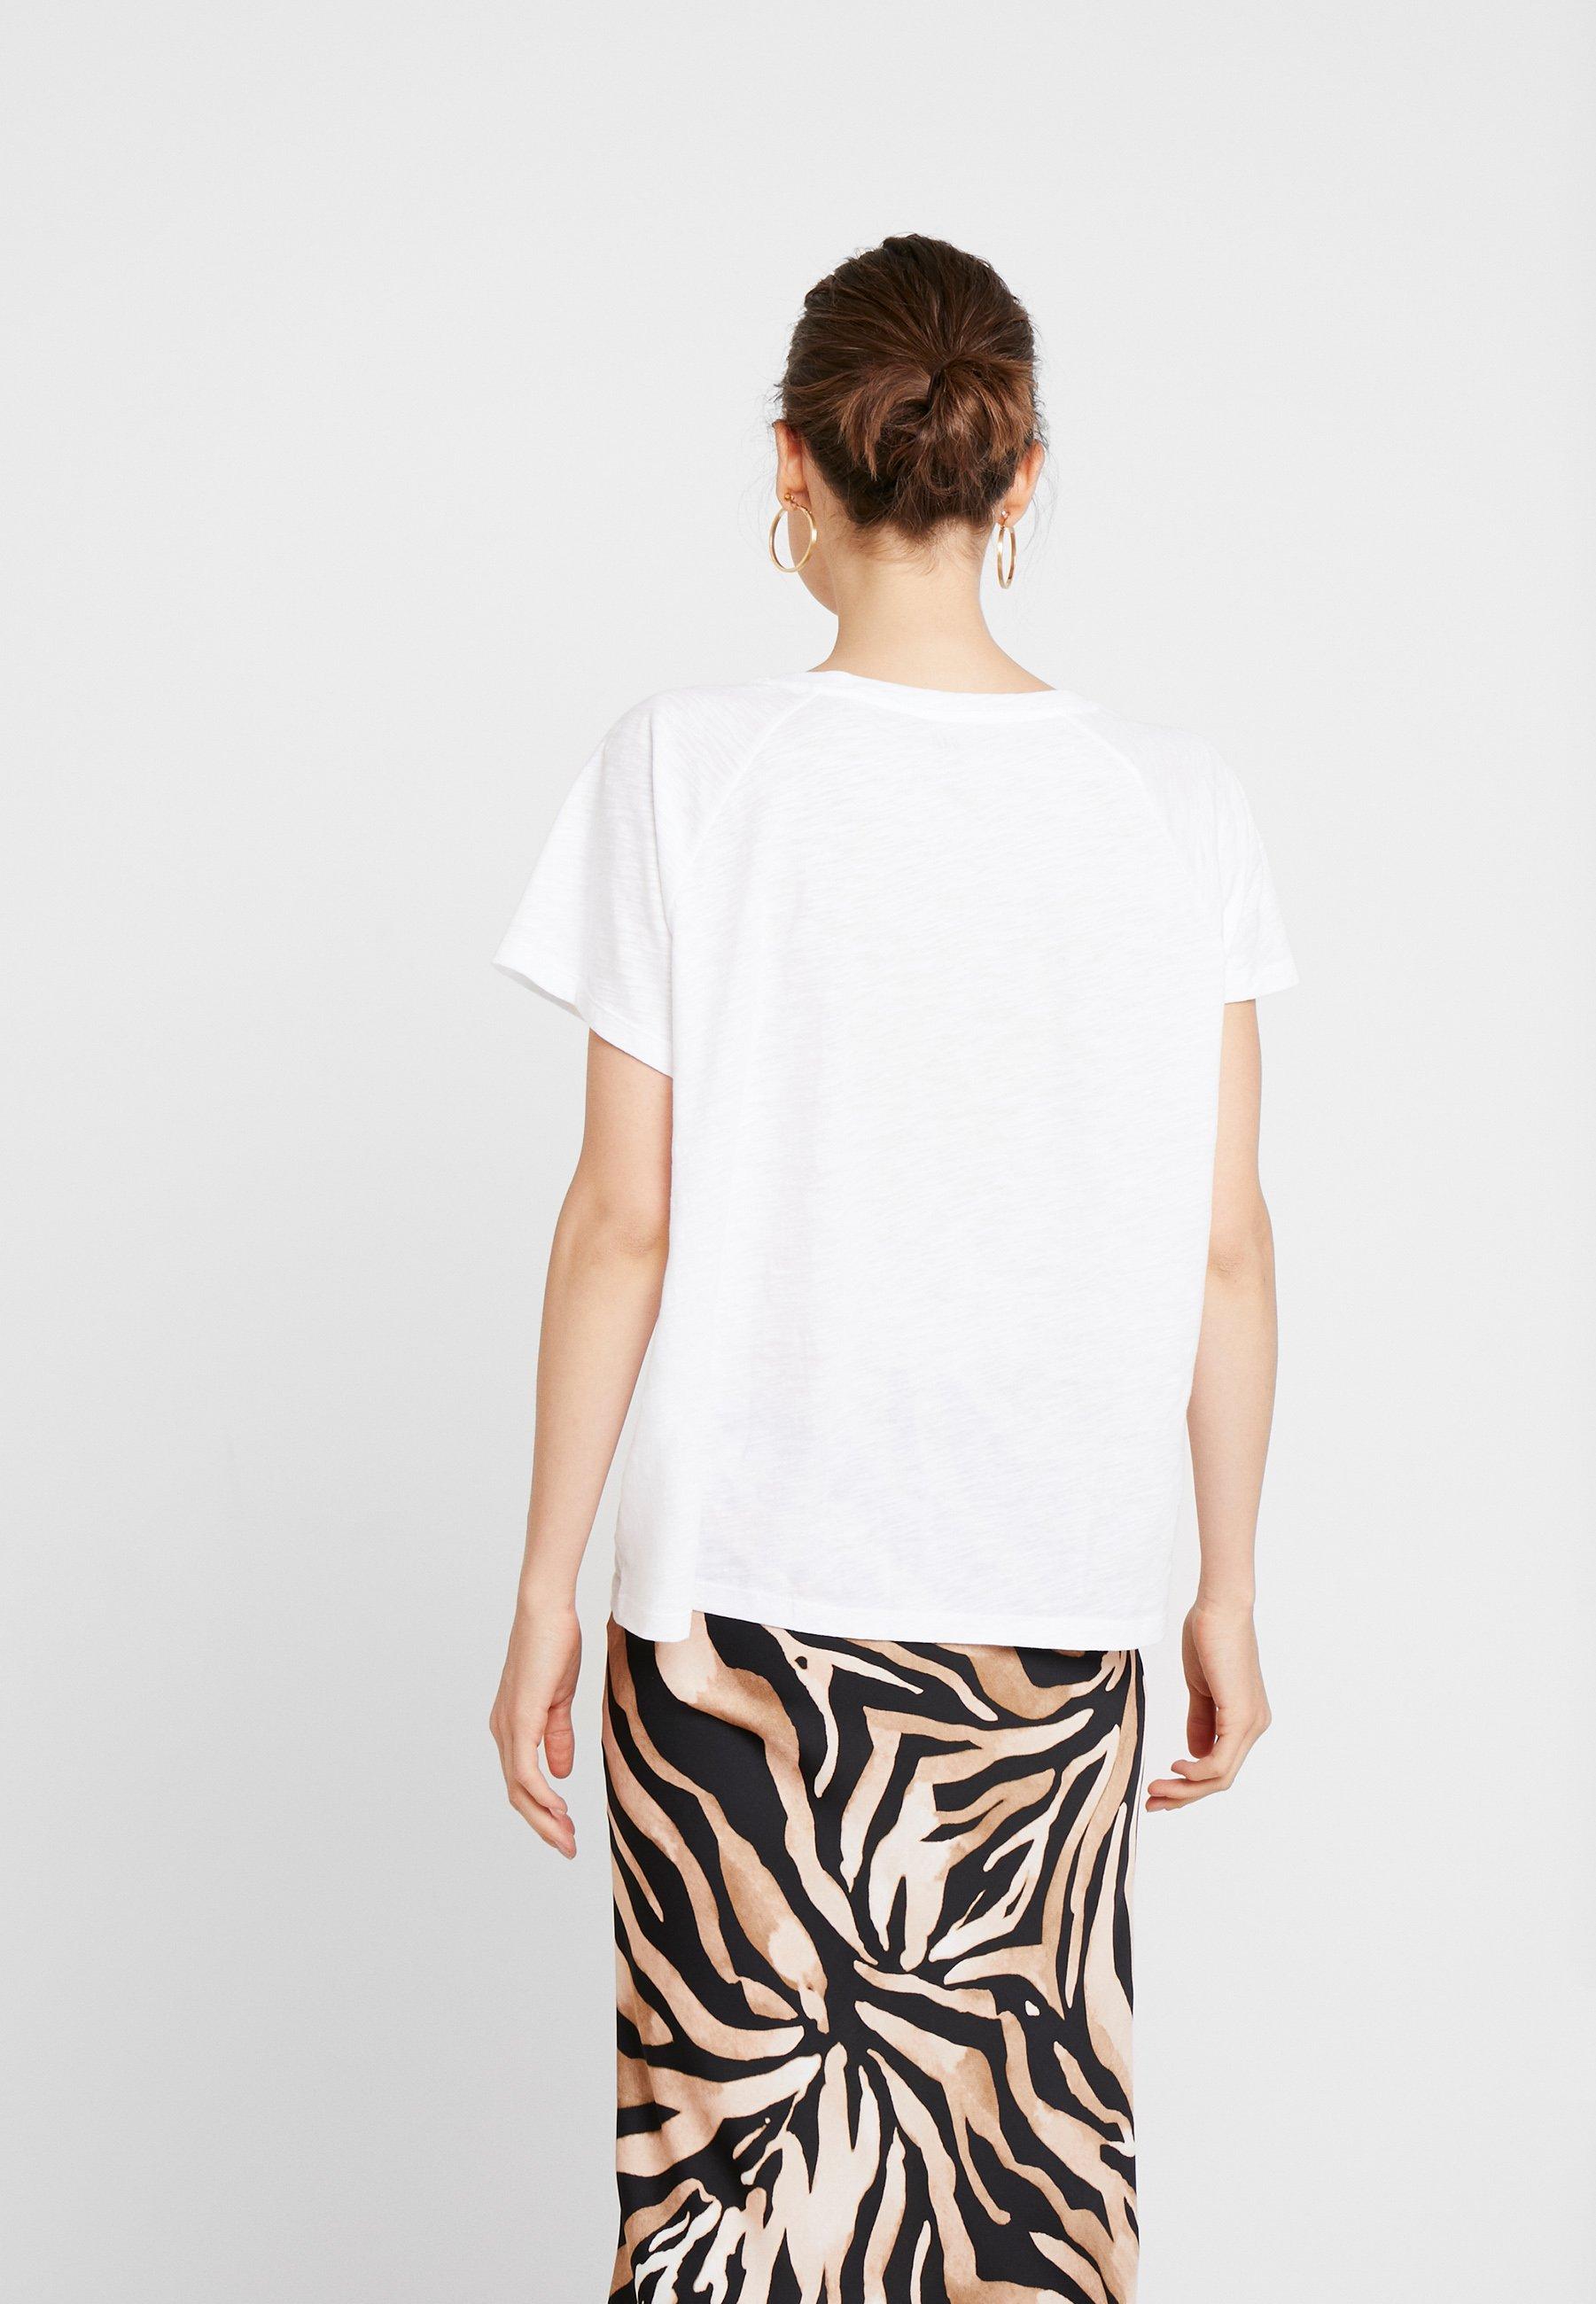 White Basique shirt SlubT SlubT Gap Gap Gap Basique shirt White 3ASc5Lq4Rj